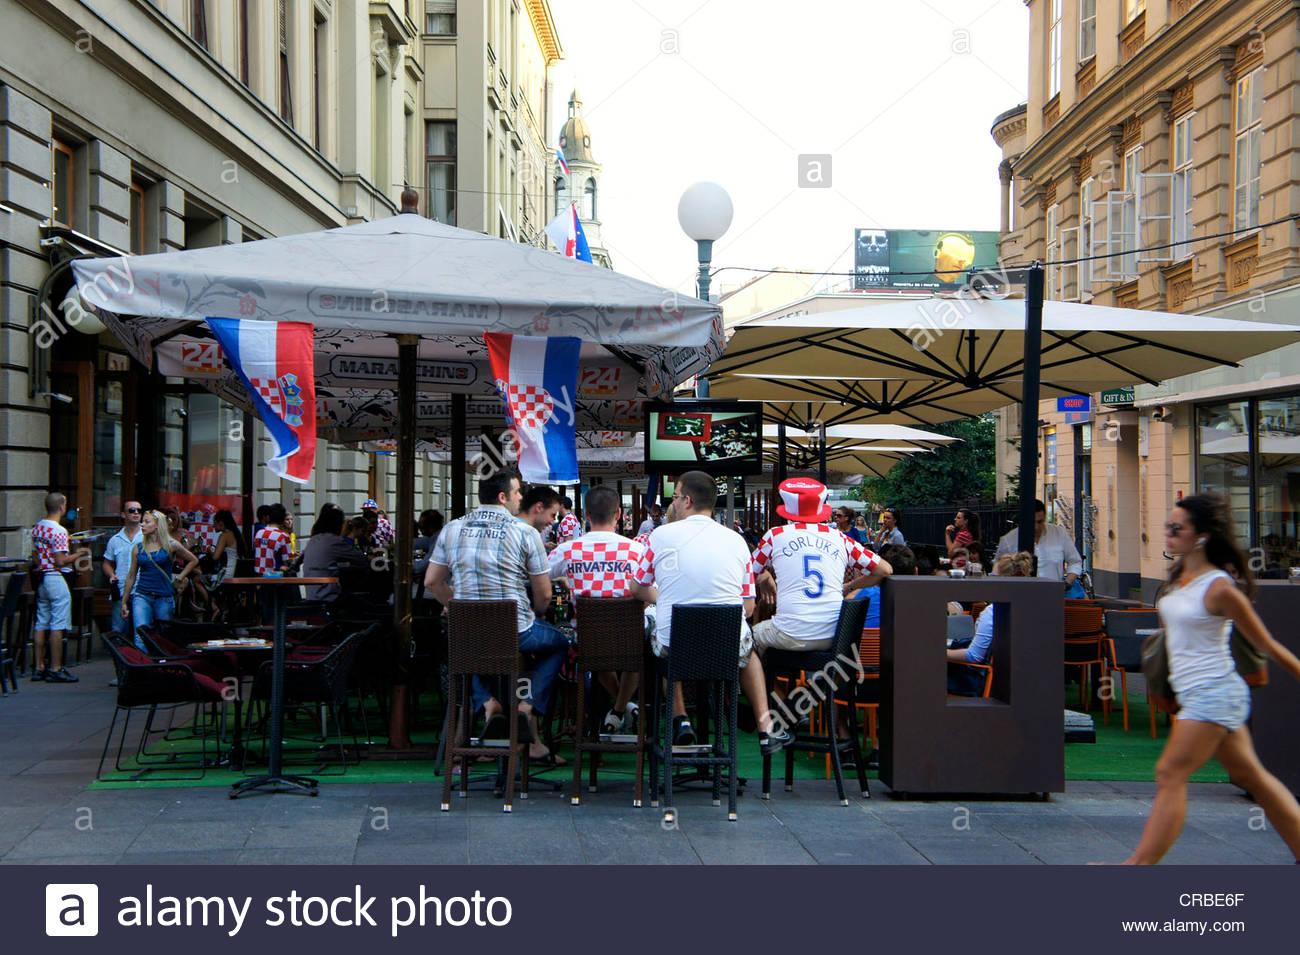 18th June 2012, Euro 2012. Croatian fans waiting for a football match in a cafe. Croatia vs Spain,Zagreb,Croatia - Stock Image